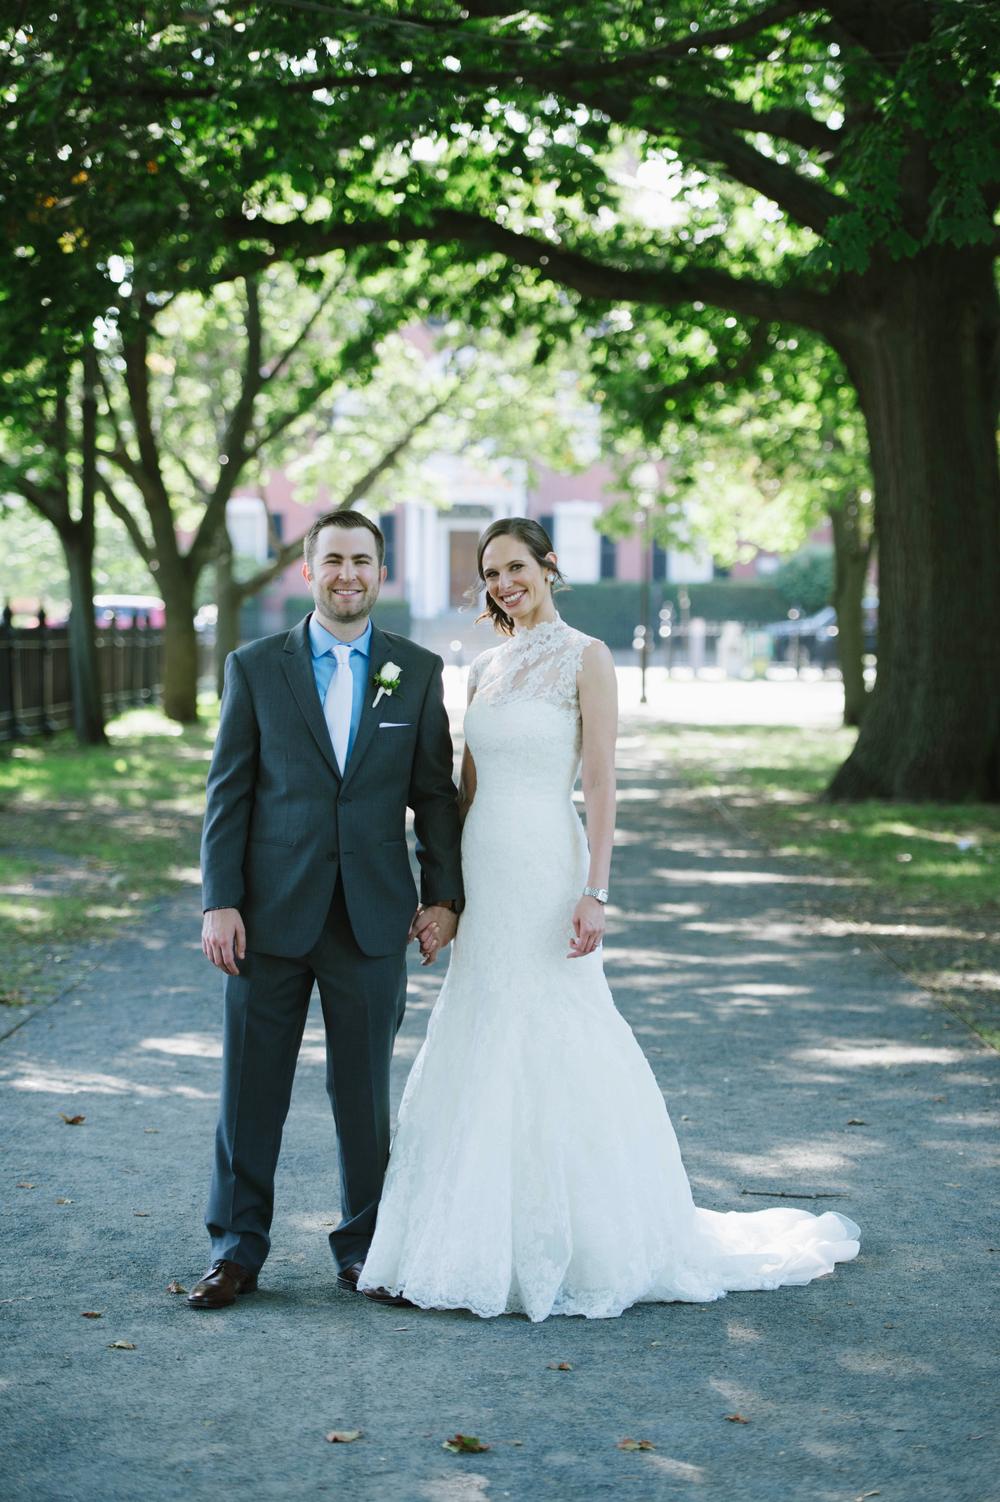 Salem_Massachusetts_Wedding004.jpg